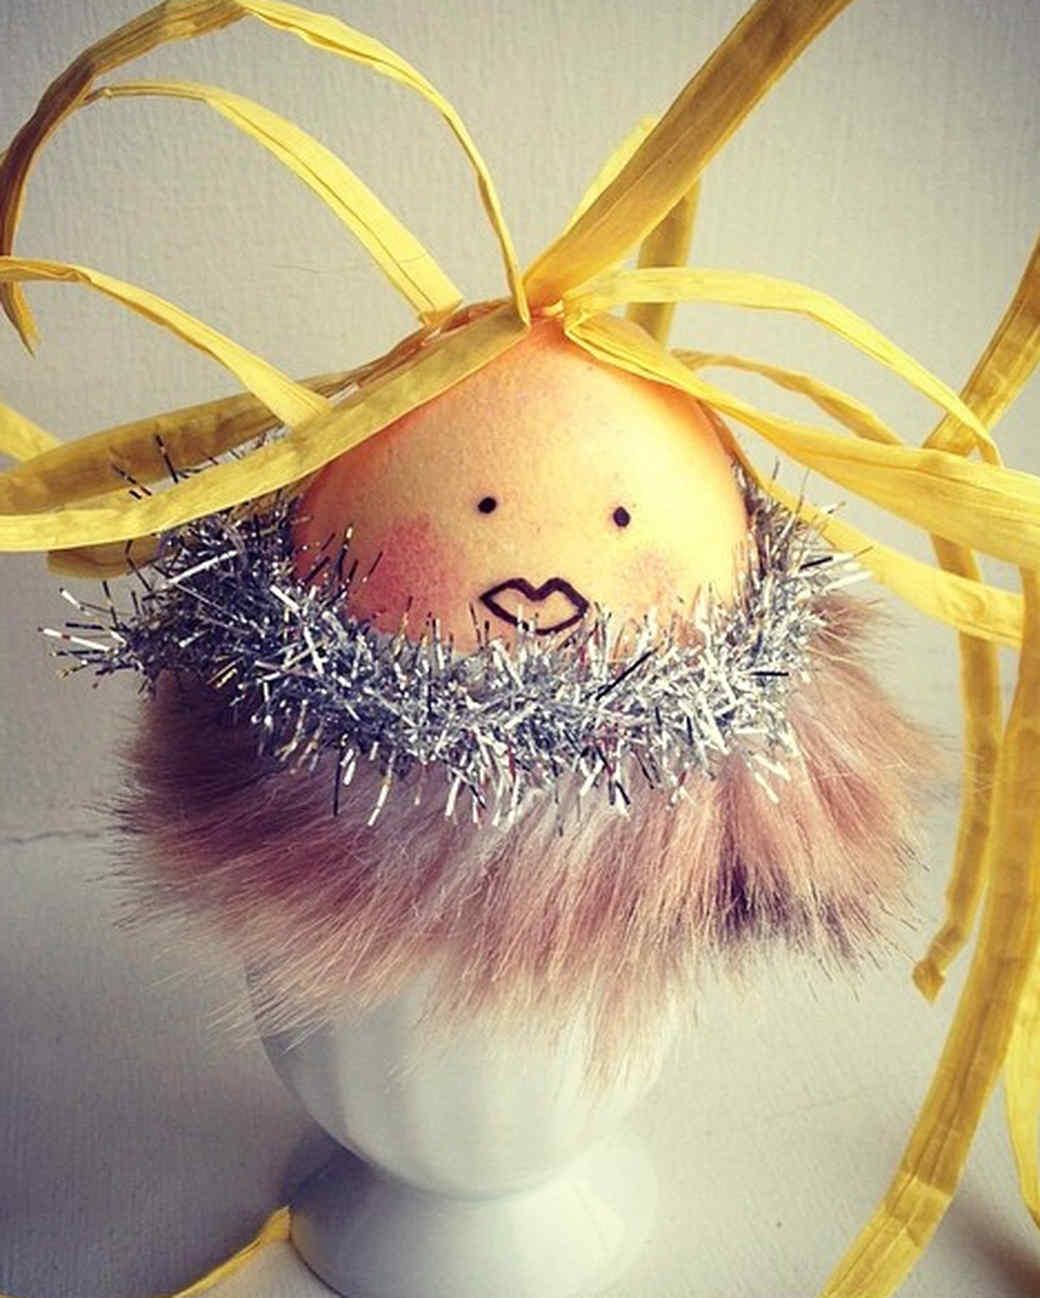 marthas-egg-hunt-sweetdanib-0414.jpg